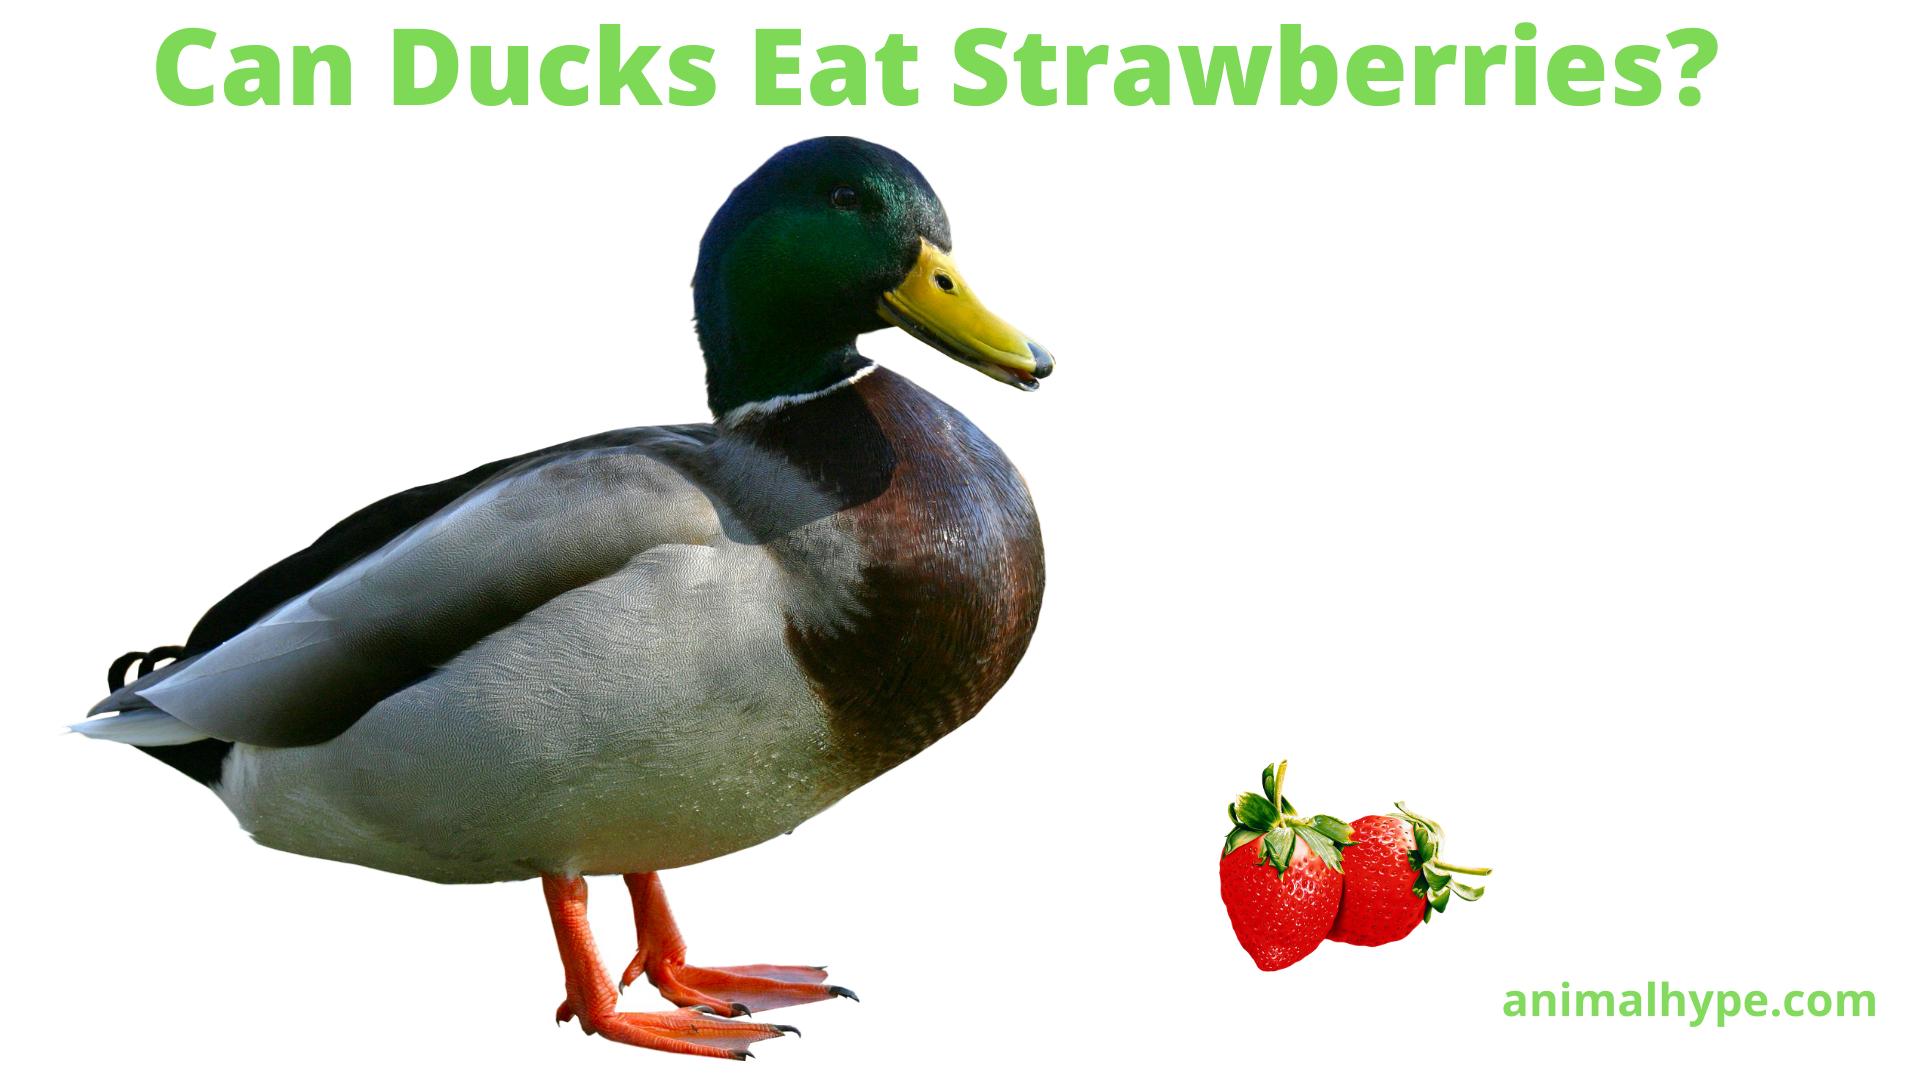 Can Ducks Eat Strawberries